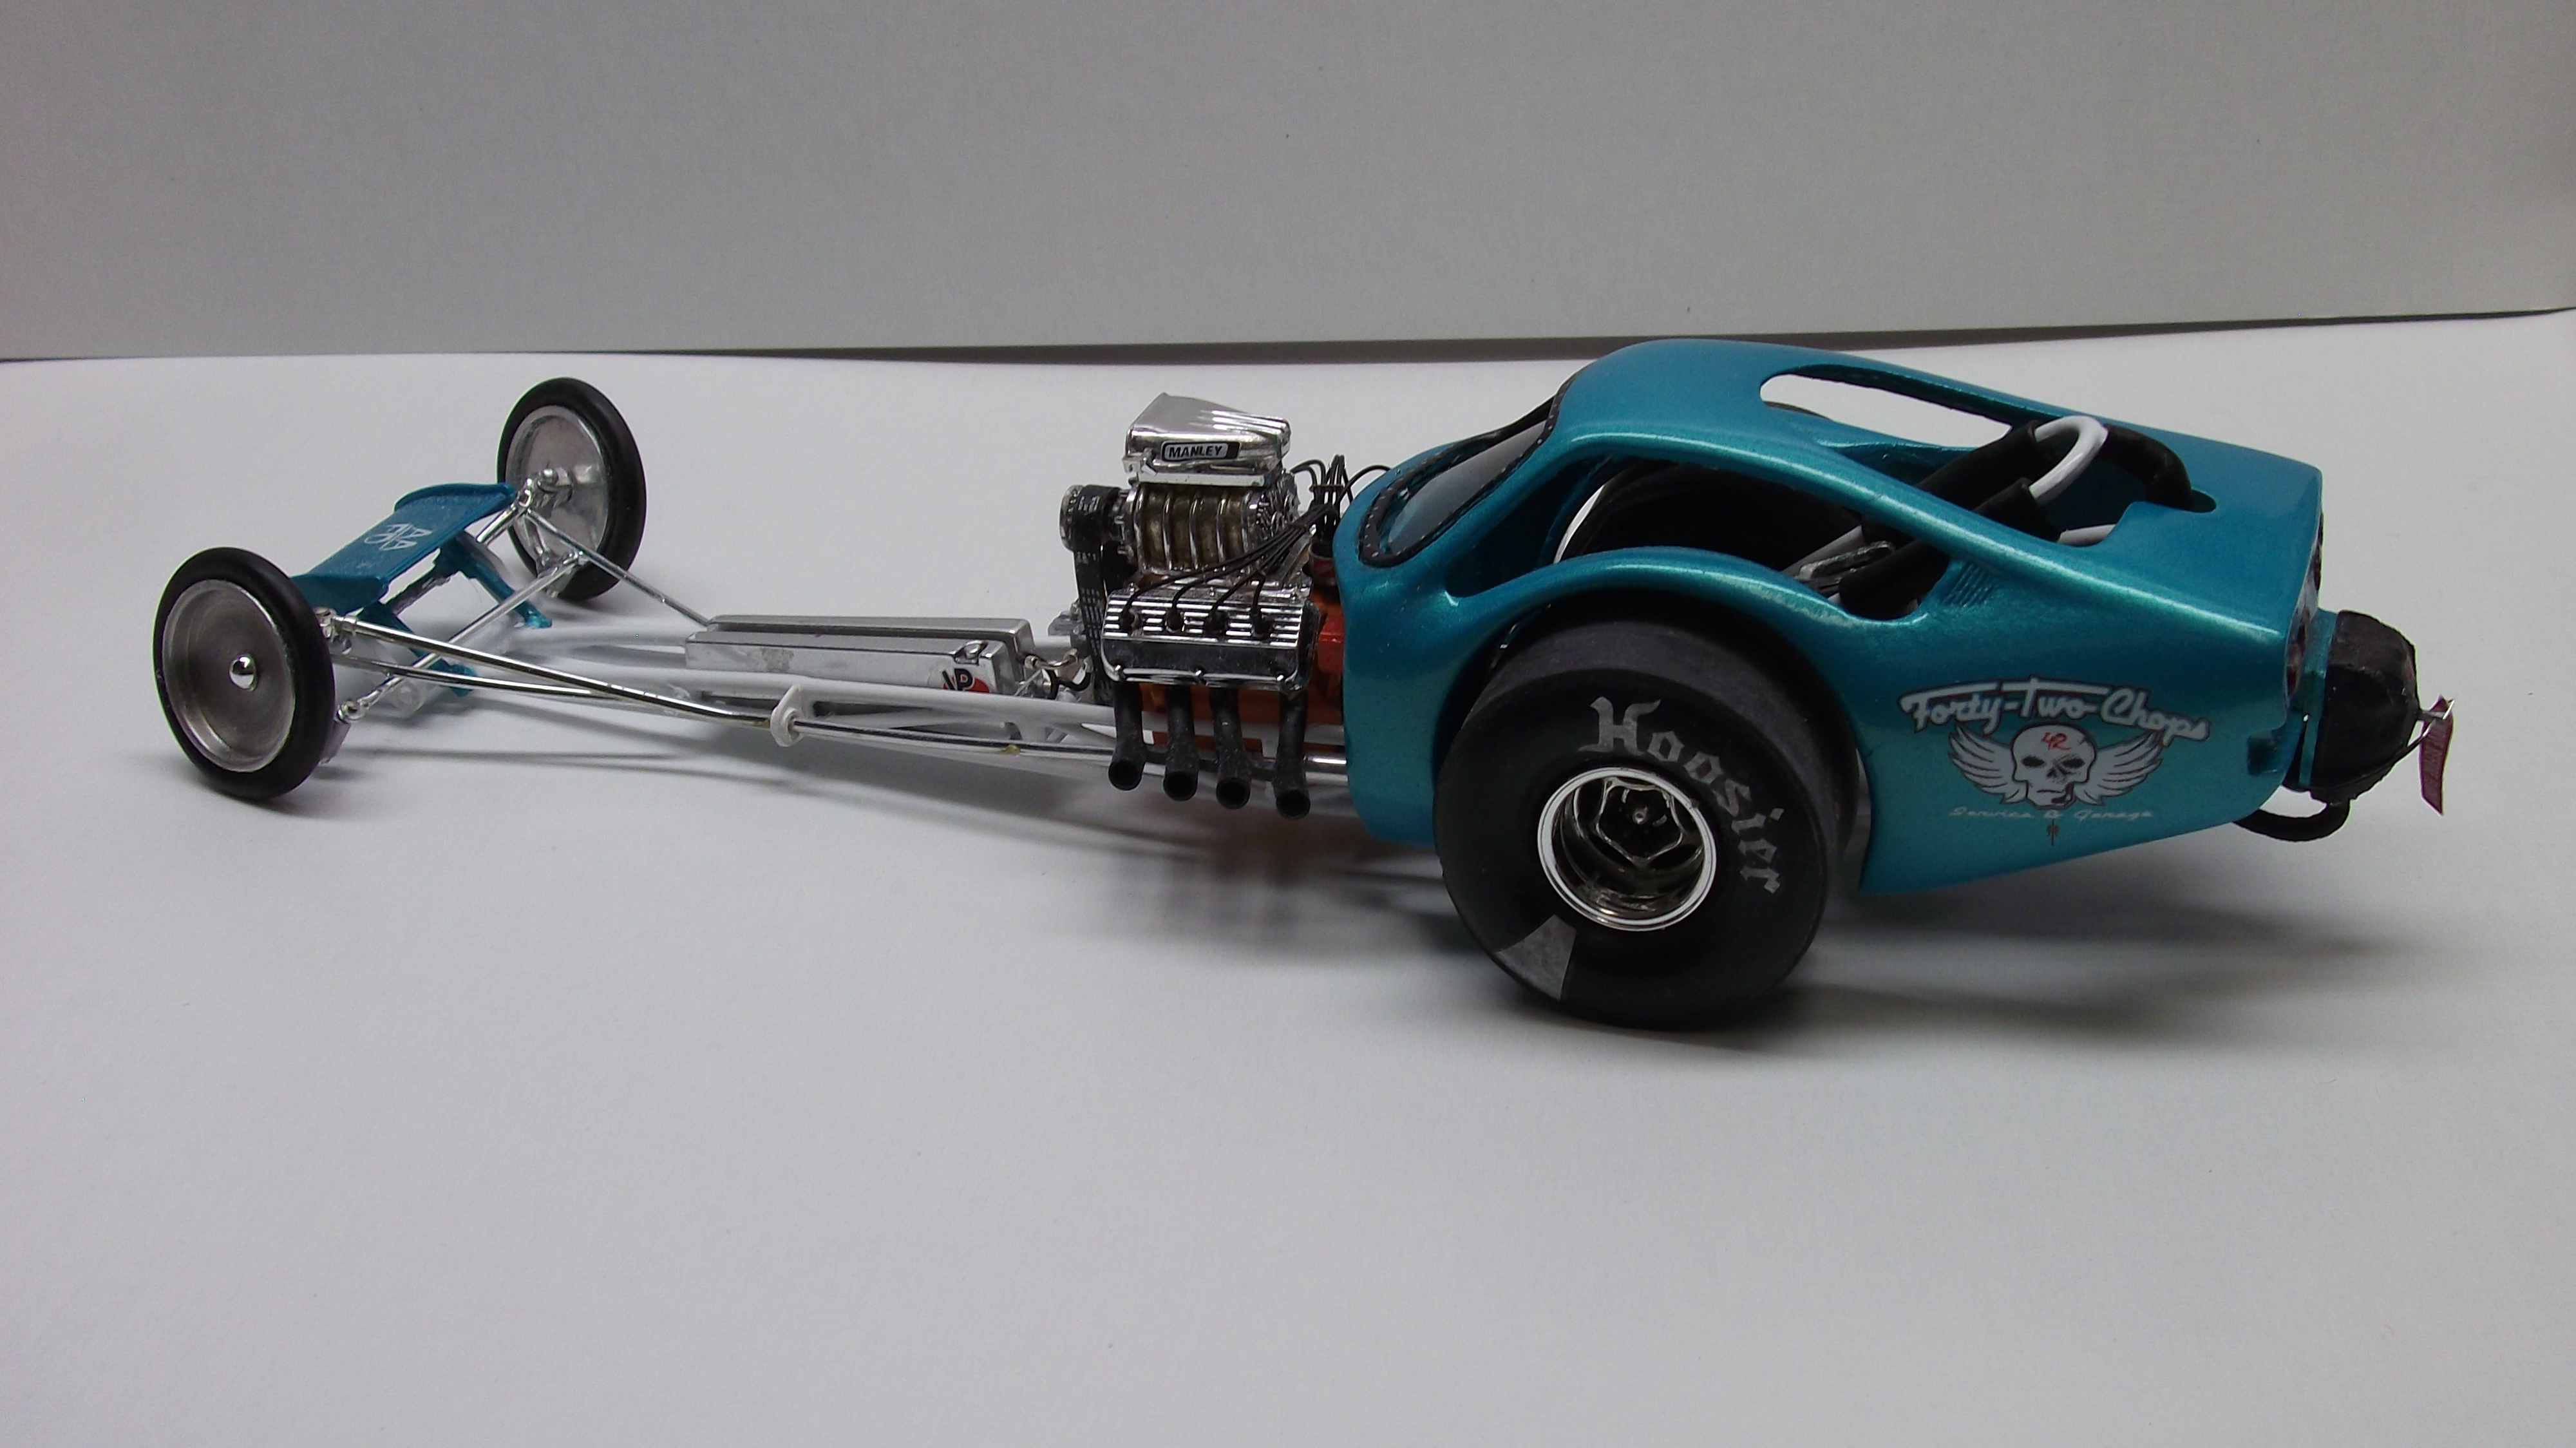 71 - 73 Vega dragster - Drag Racing Models - Model Cars Magazine Forum